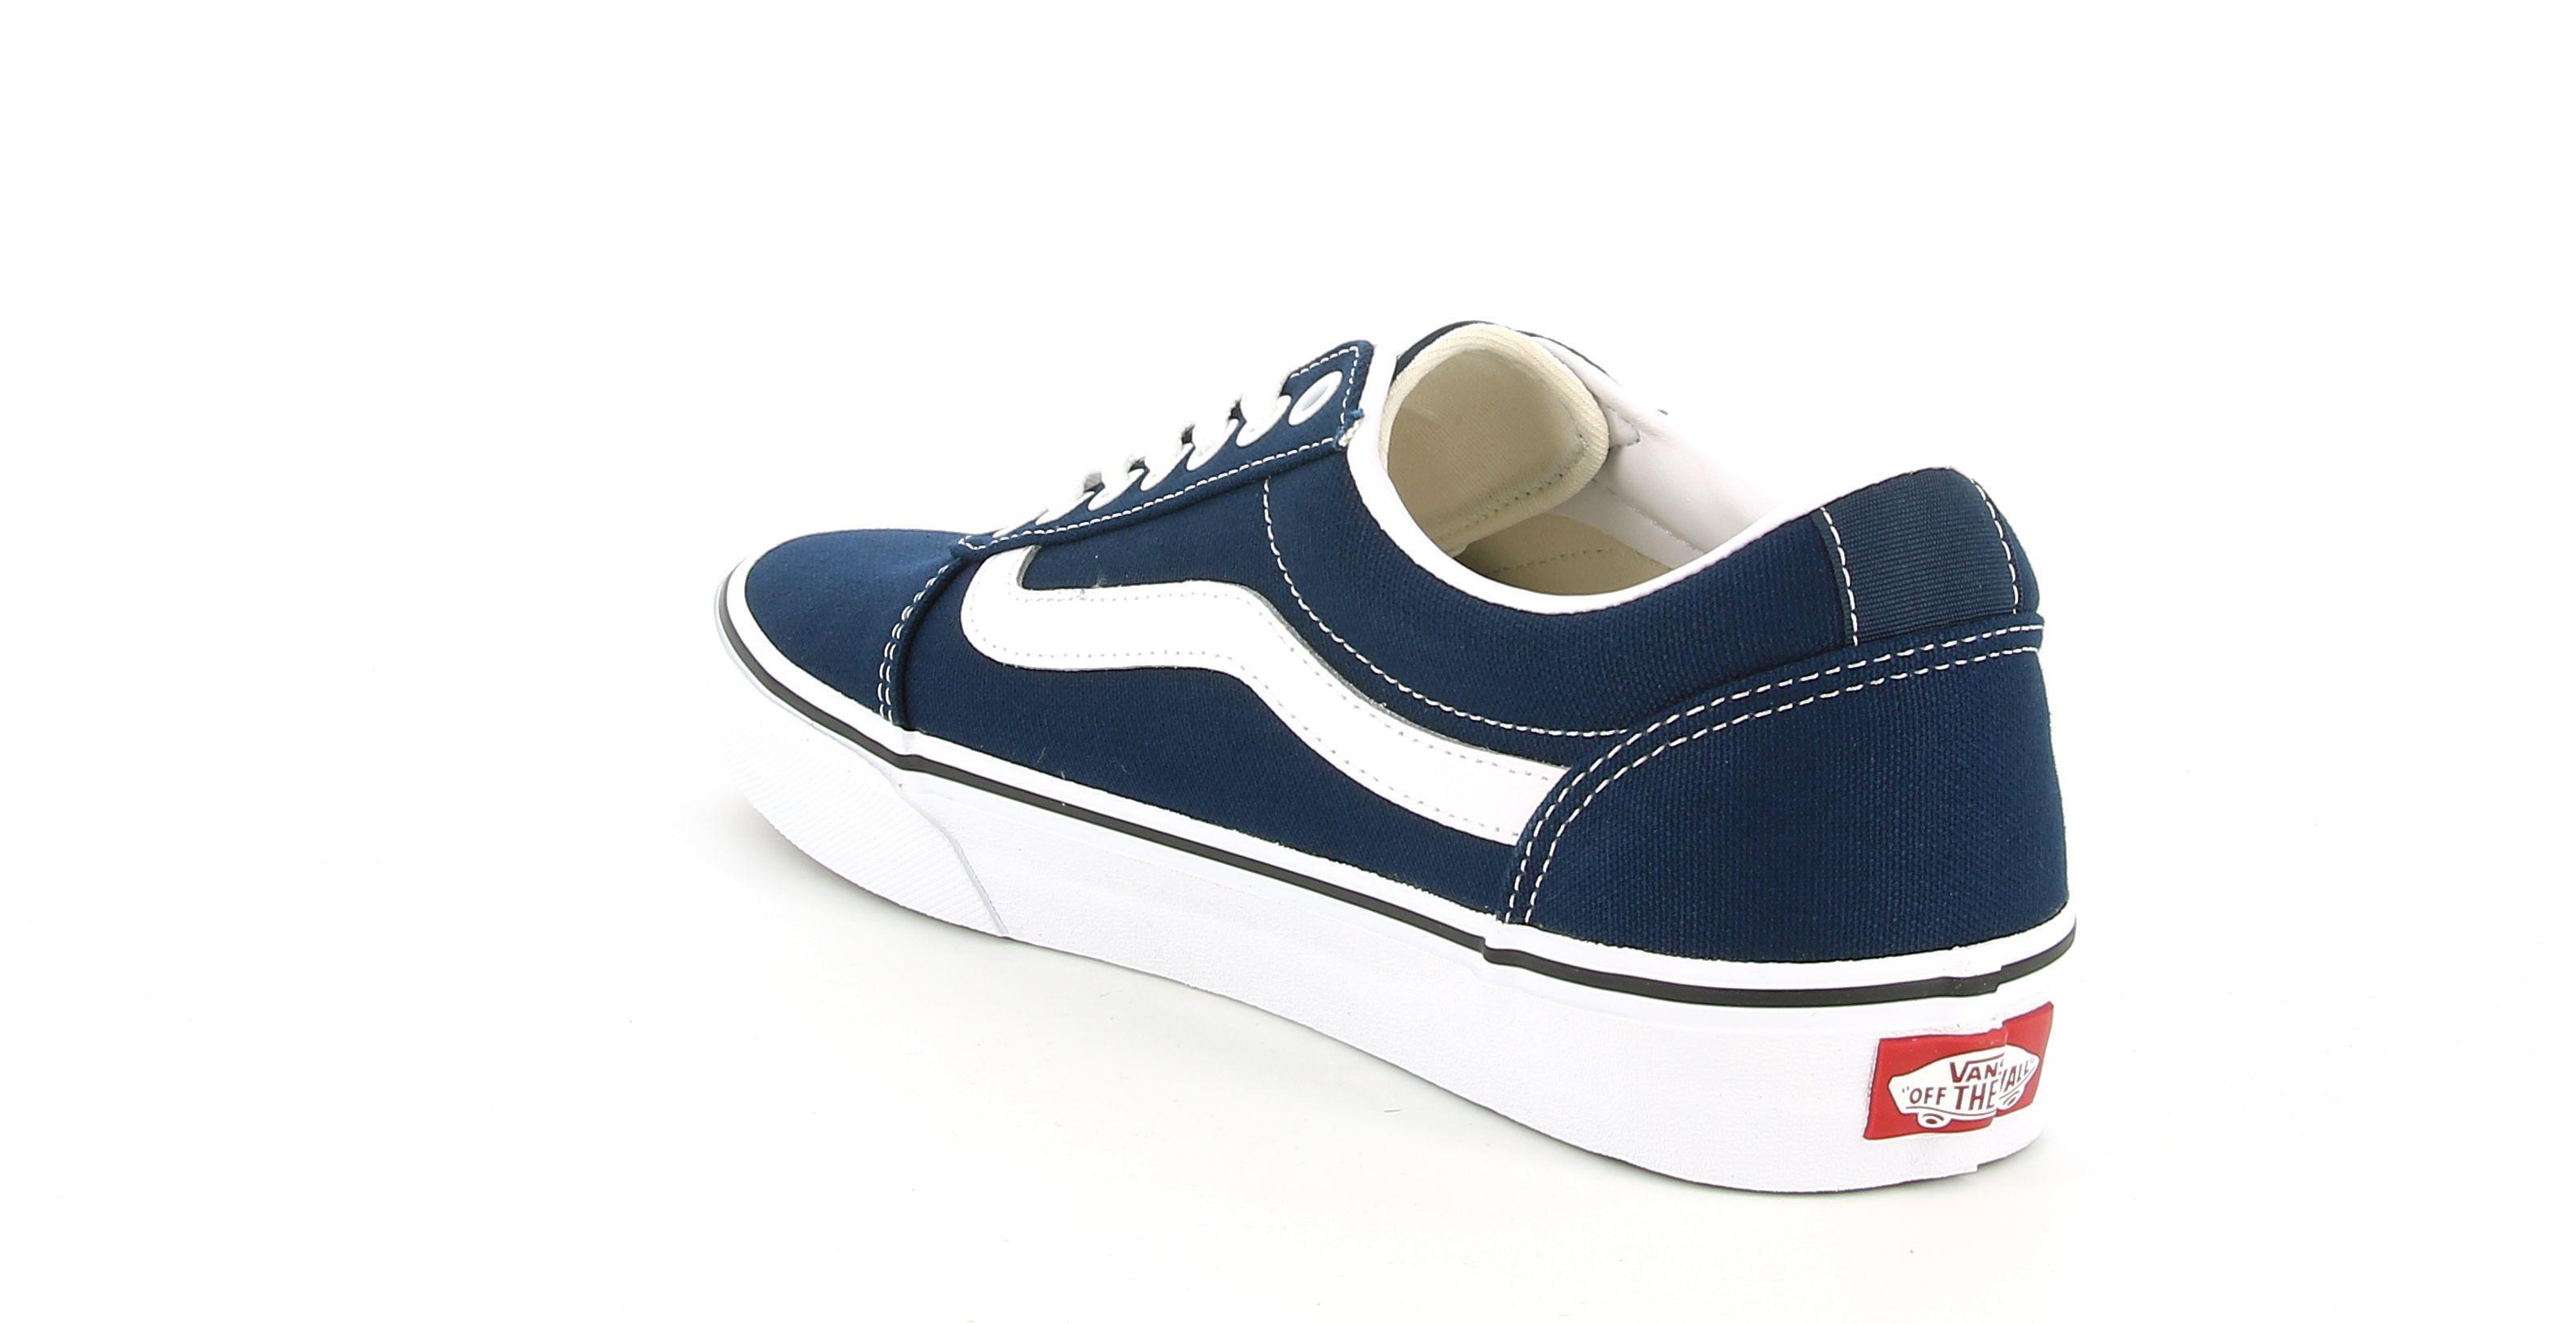 vans vans vn0a38dmjy31 ward sneakers bassa da uomo blu bianca